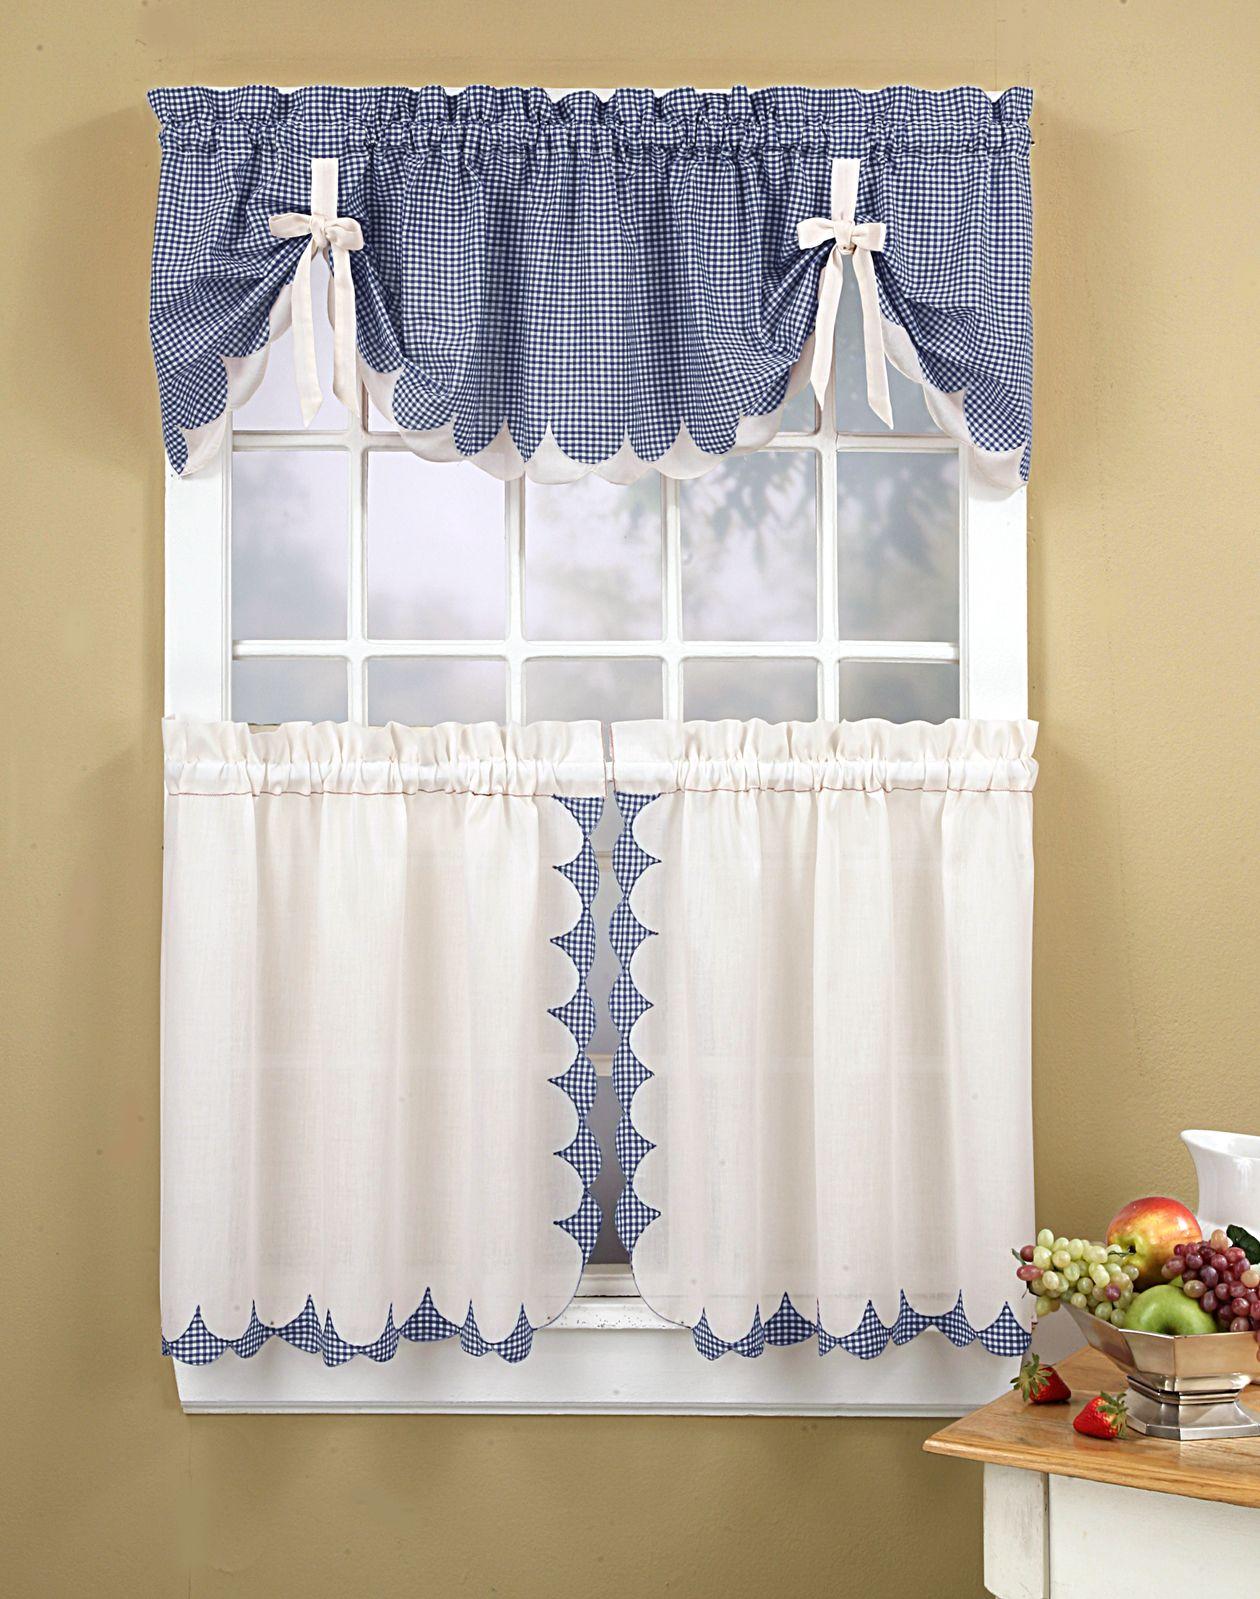 kitchen window treatment ideas Kitchen Curtains Tabitha 3 Piece Kitchen Curtain Tier Set Curtainworks com I